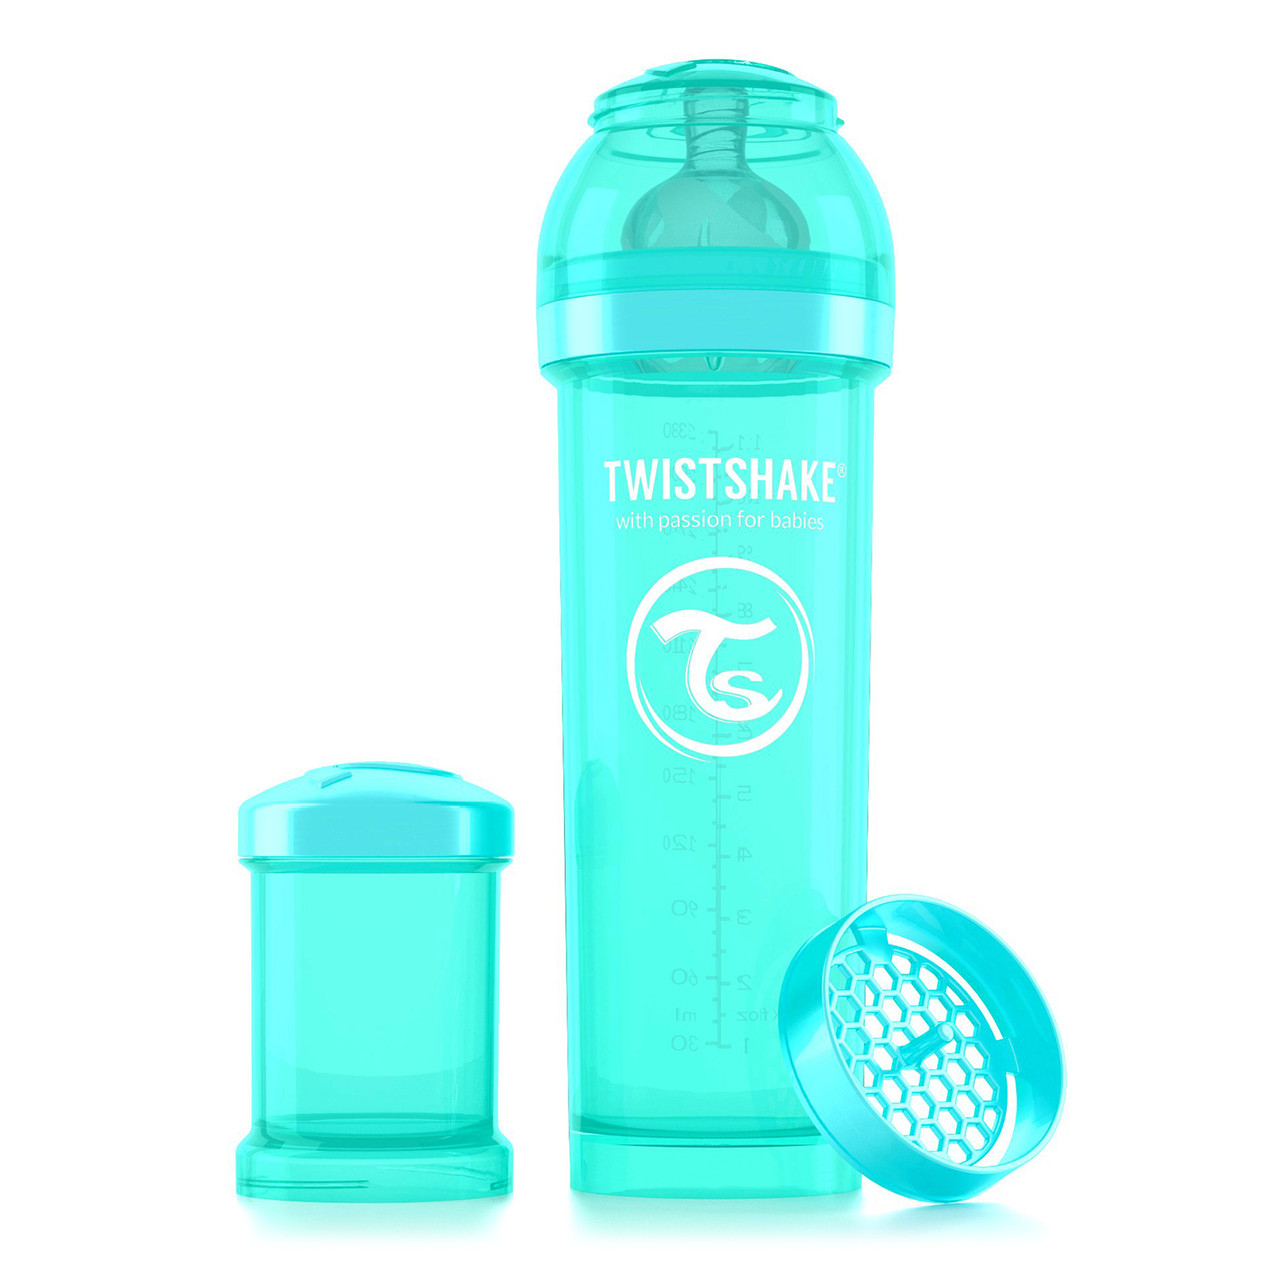 Антиколиковая бутылочка Twistshake для кормления 330 мл. Бирюзовая (Sleepyhead)